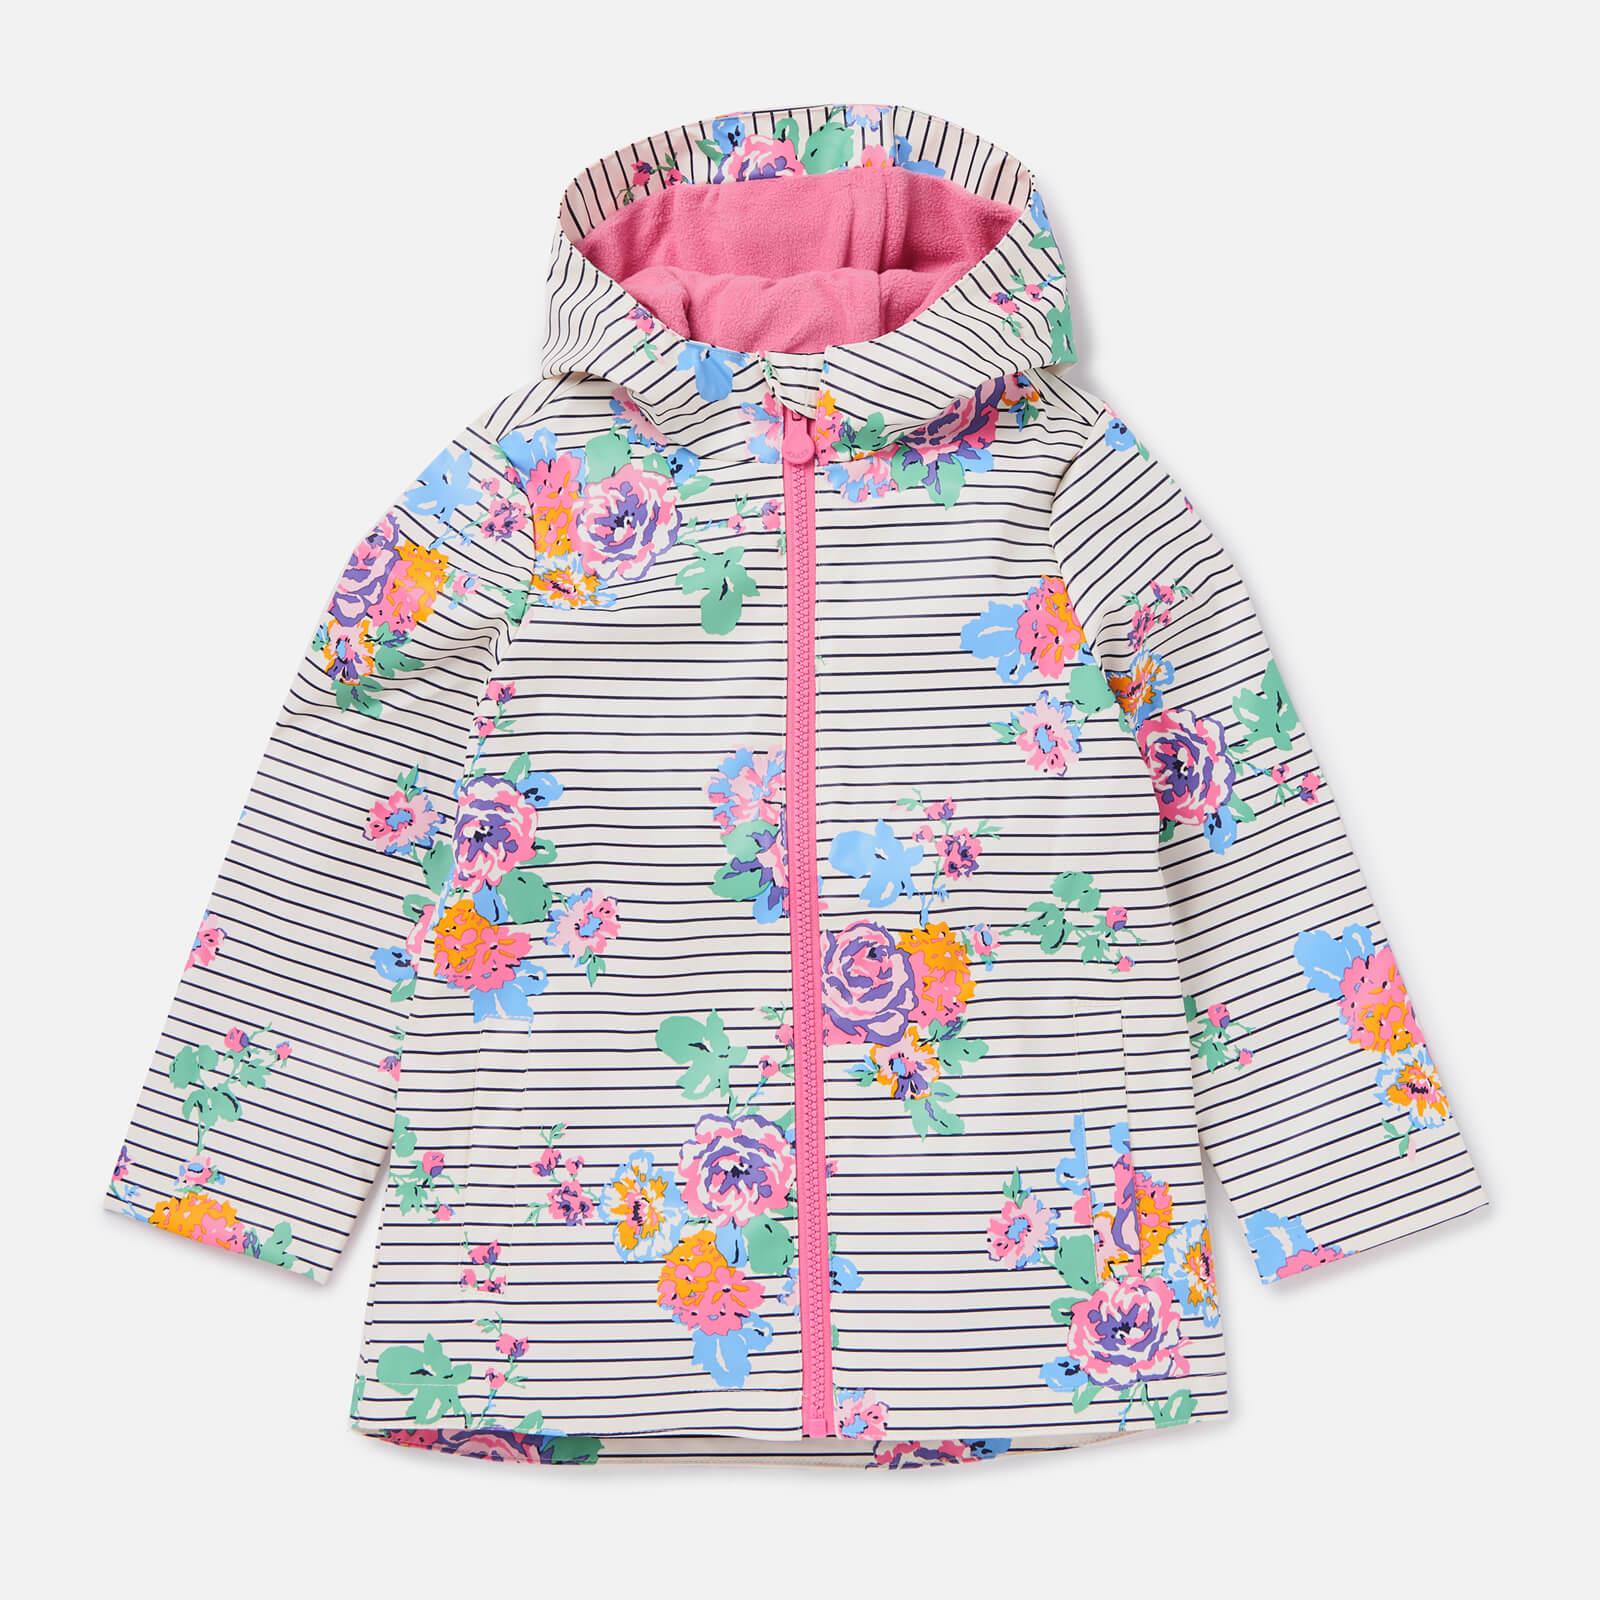 Joules Girls' Raindance Showerproof Rubber Coat - Cream Navy Floral - 3 Years